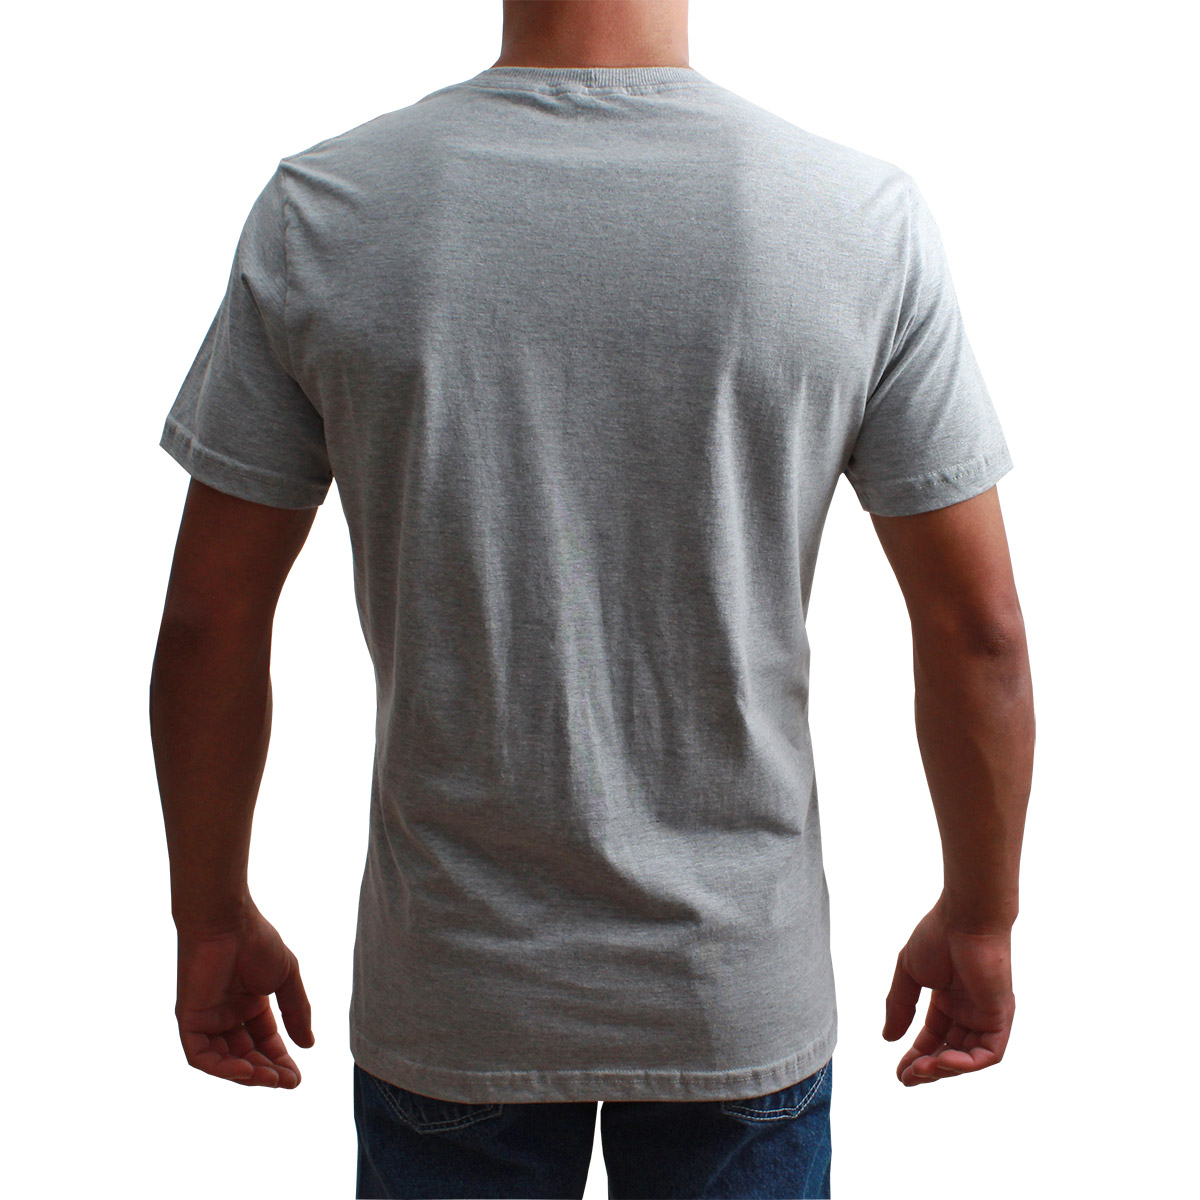 Camiseta Indian Farm Masculina Cinza Team Roping